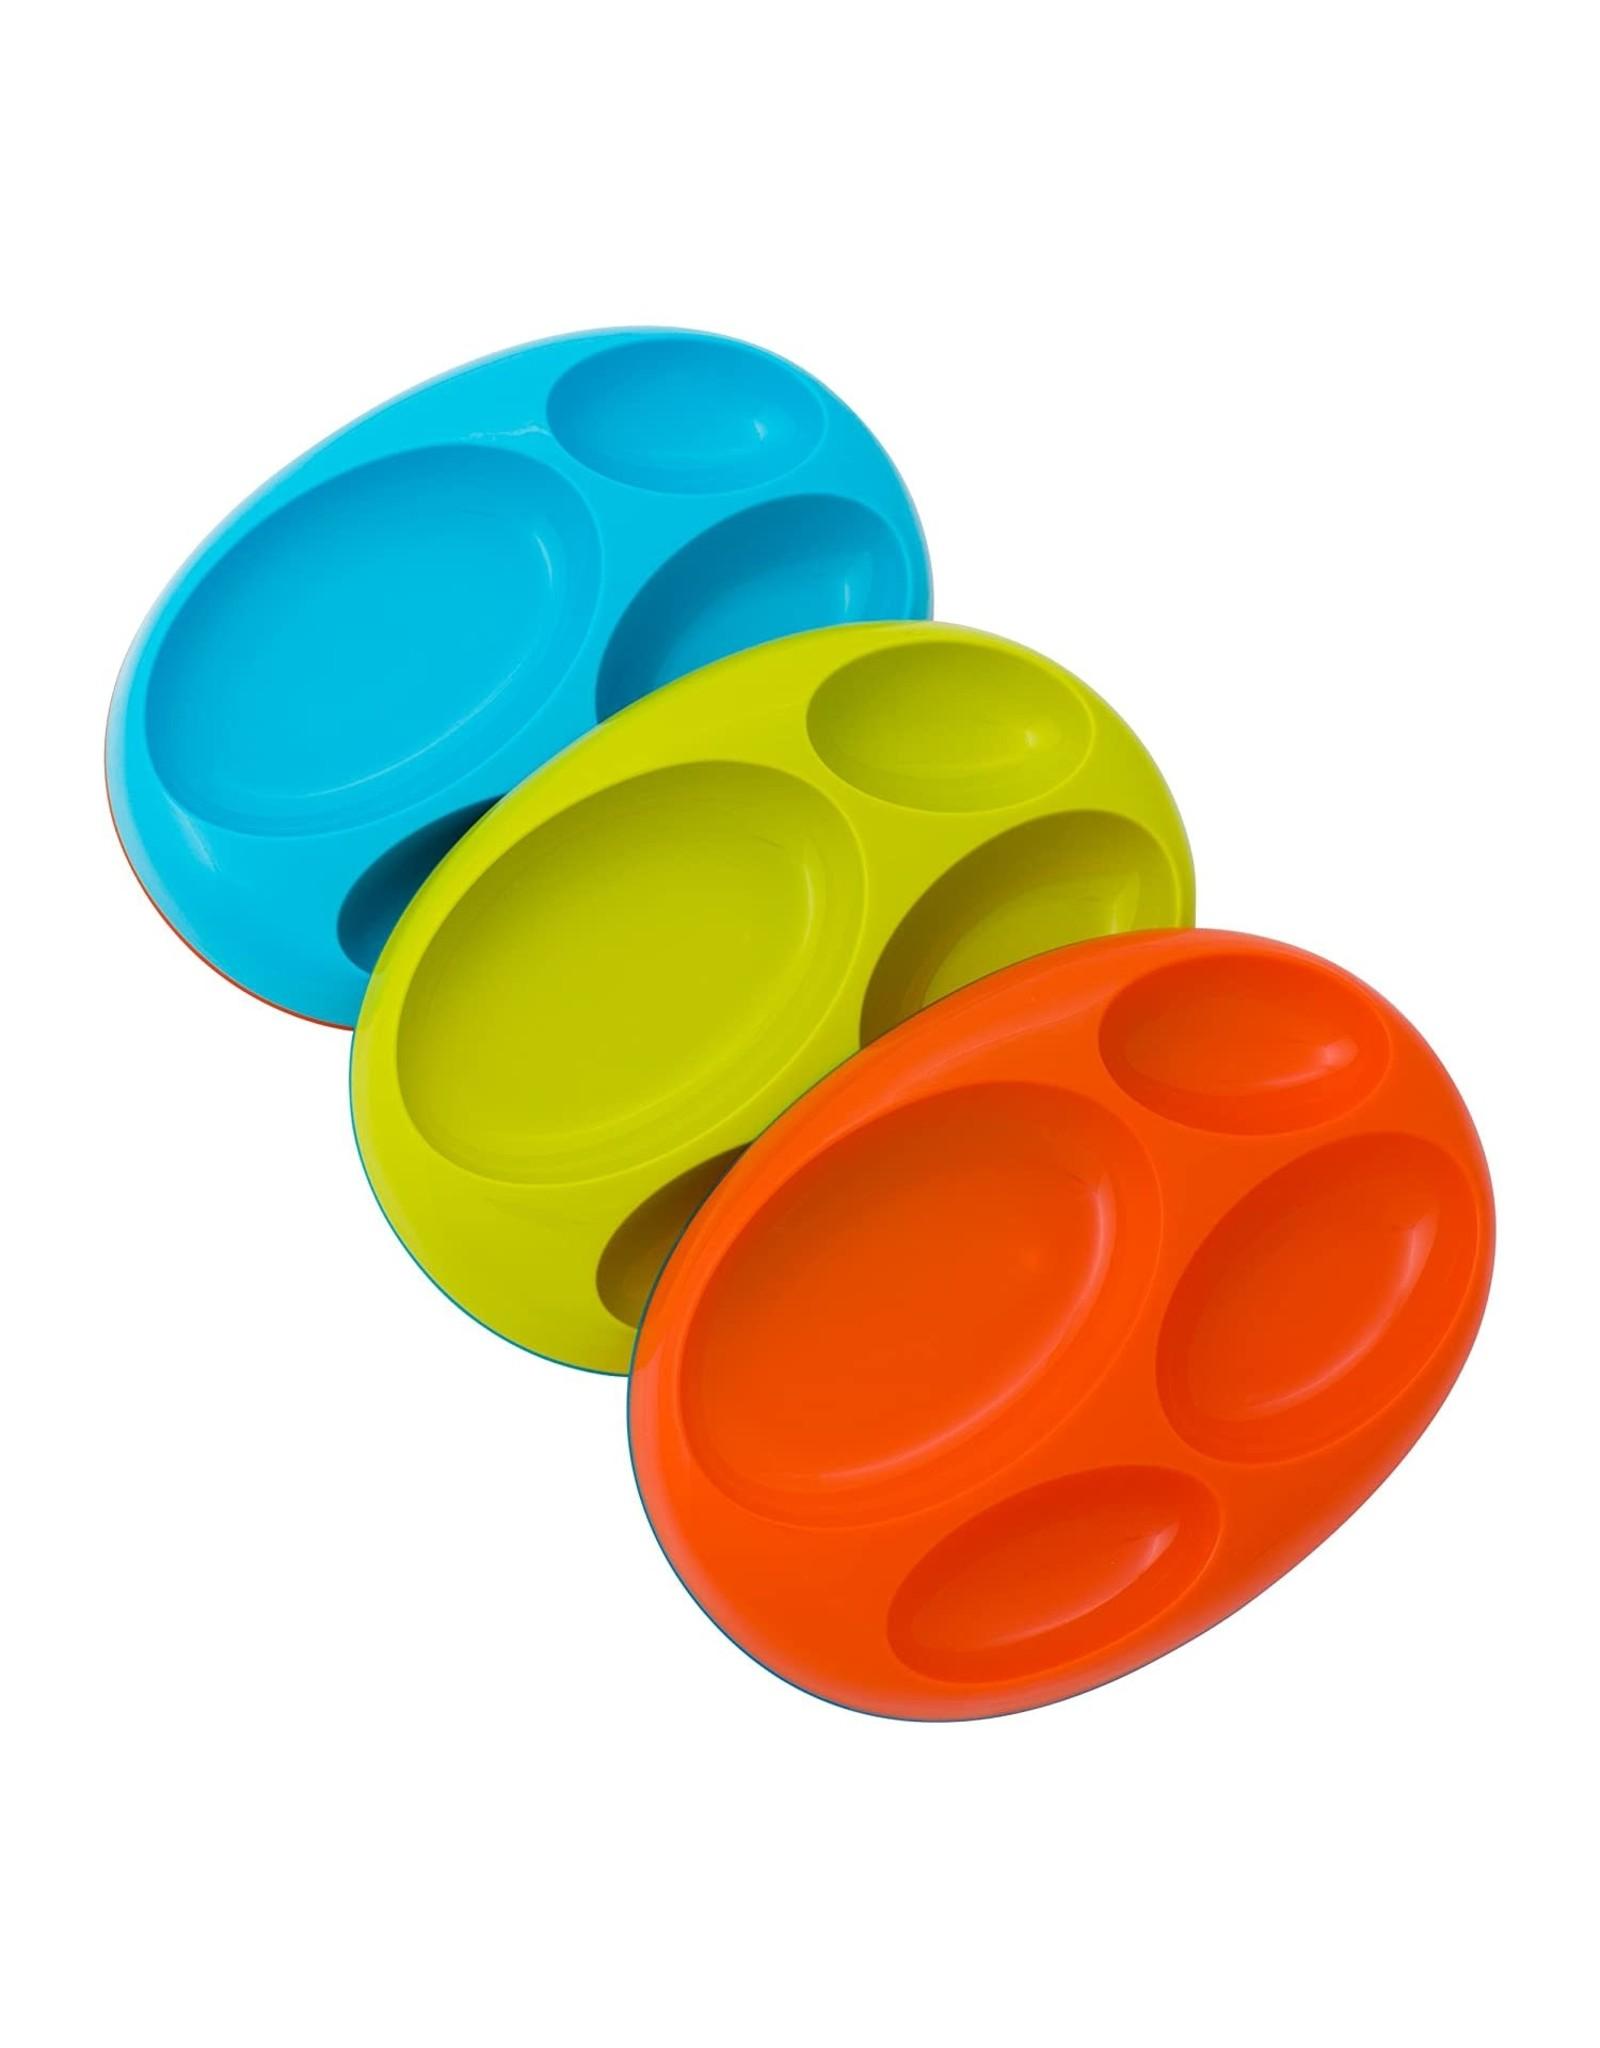 Boon Platter, Orange Large Divided Plate, 3pk